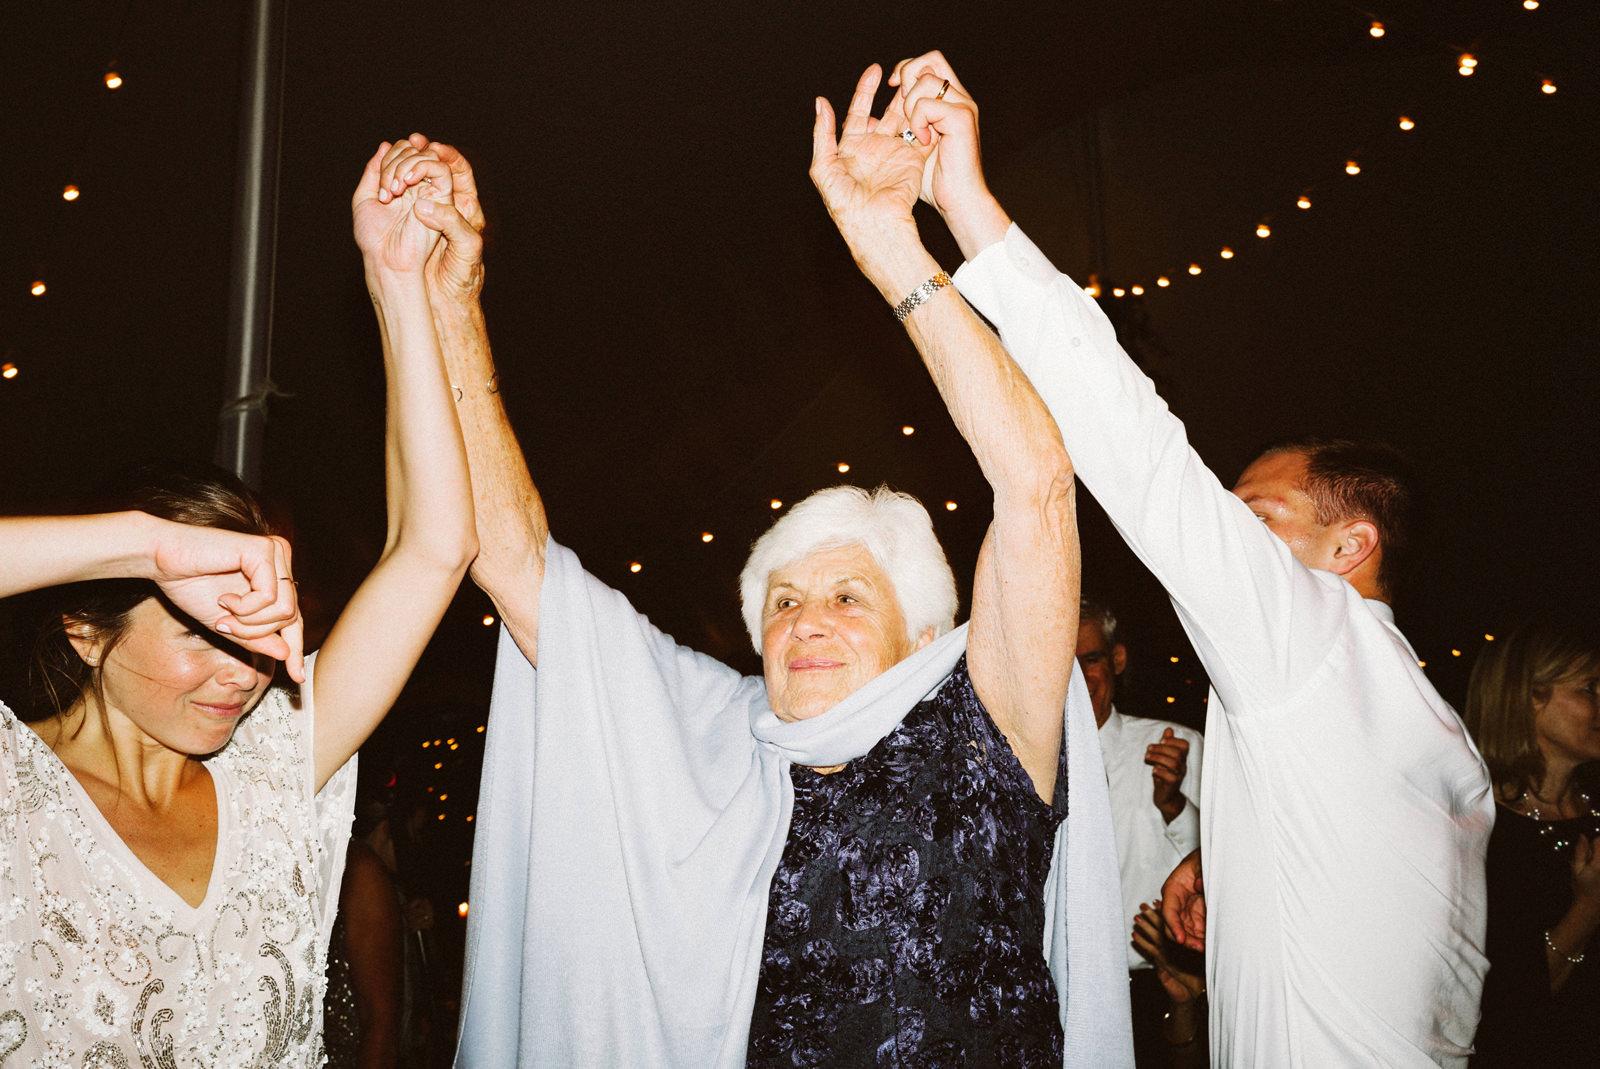 bridgeport-wedding-170 BRIDGEPORT, CONNECTICUT BACKYARD WEDDING